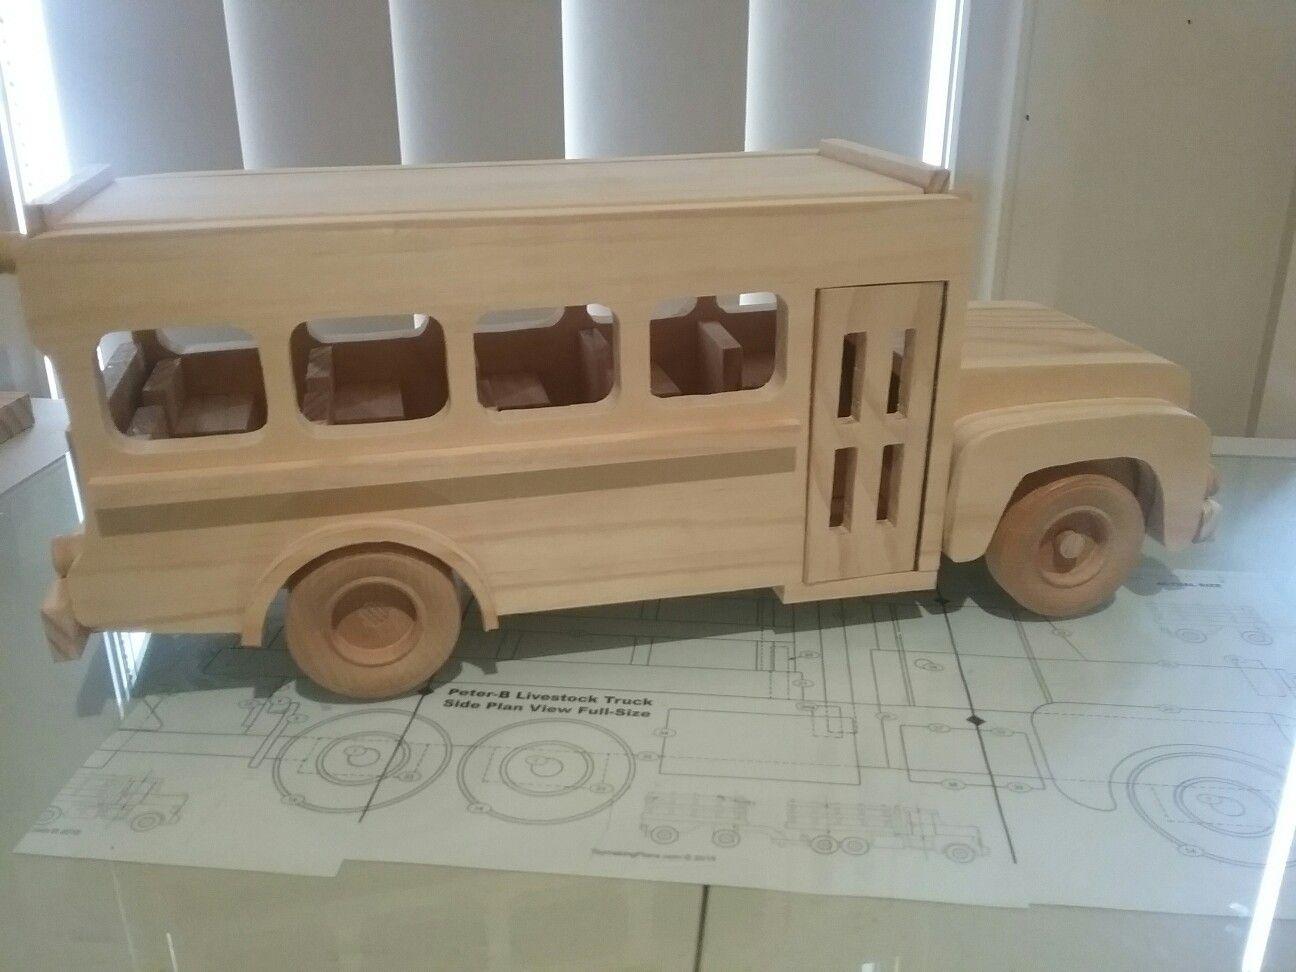 School bus Toymakingplans.com